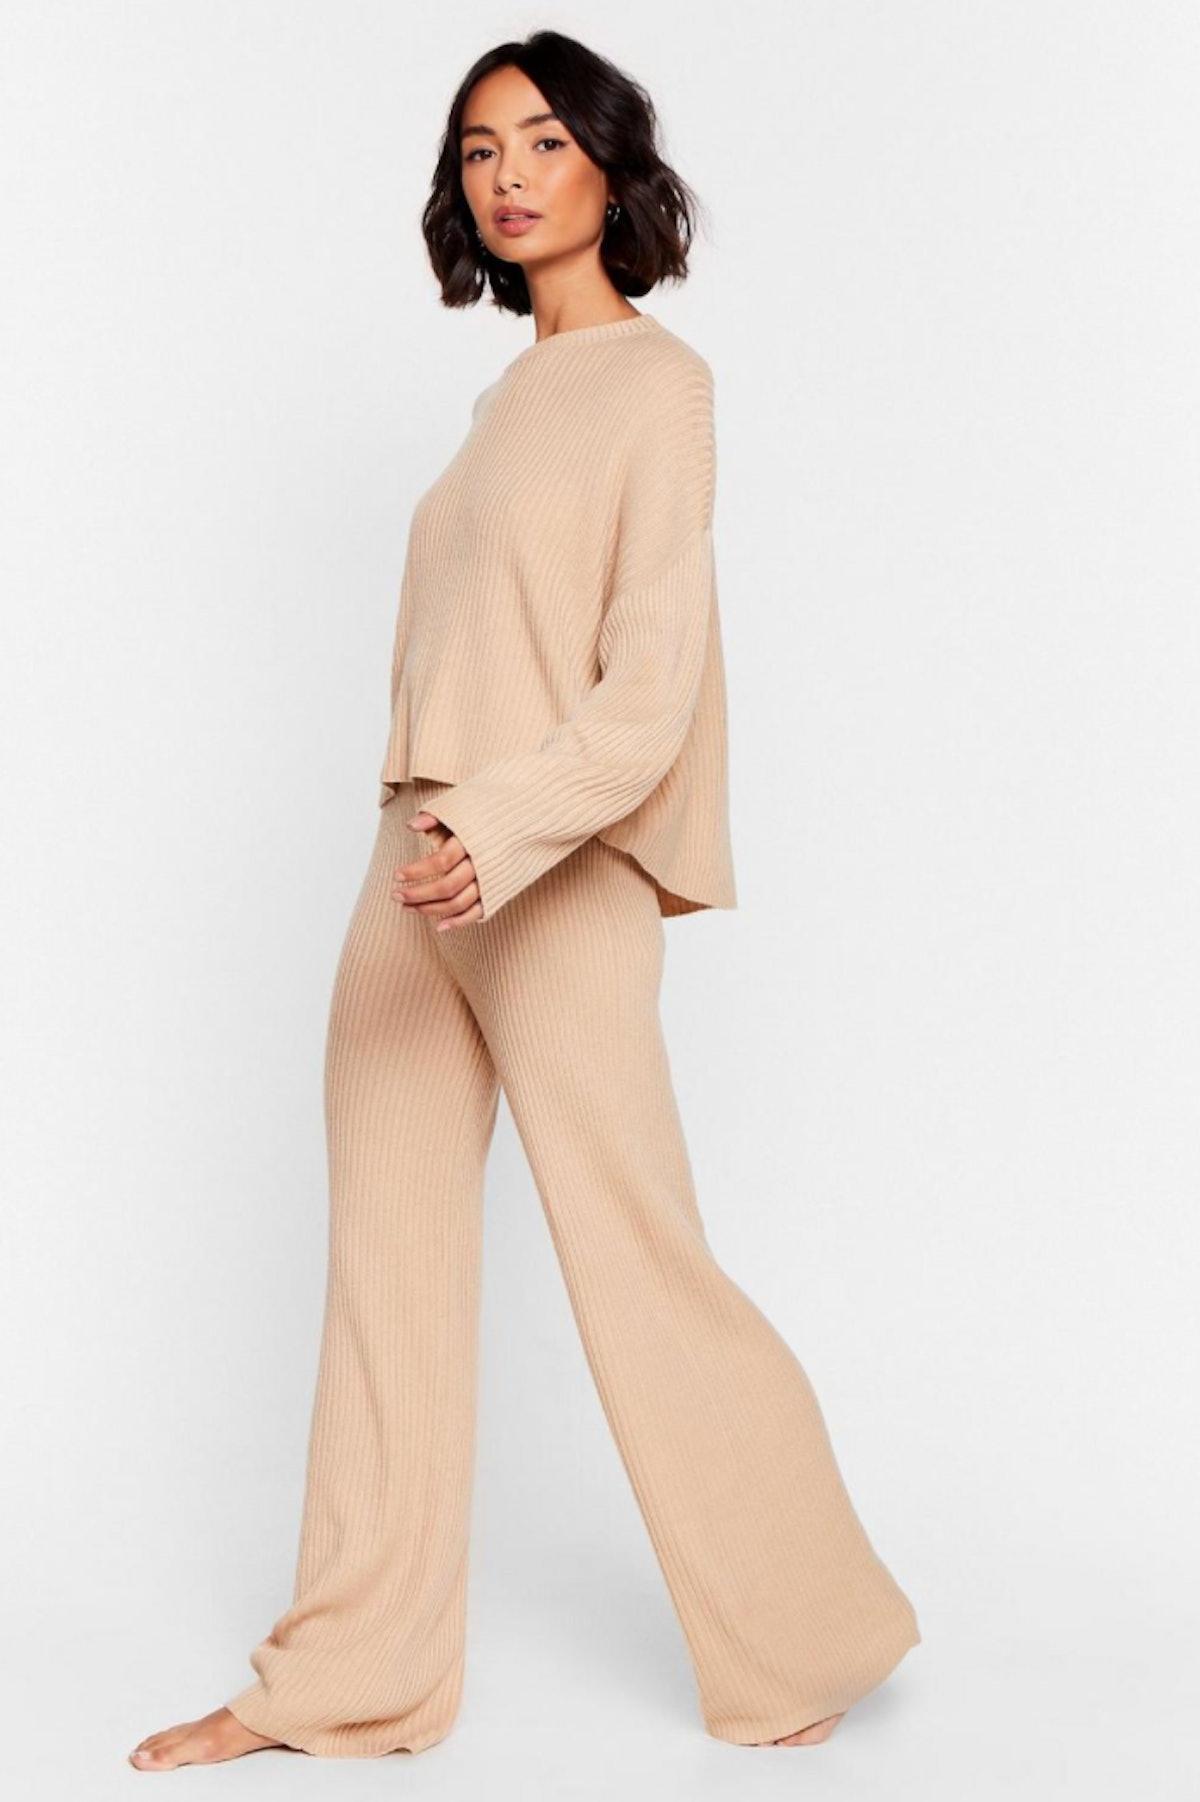 Nasty Gal Knit Alone Sweater and Wide-Leg Lounge Set